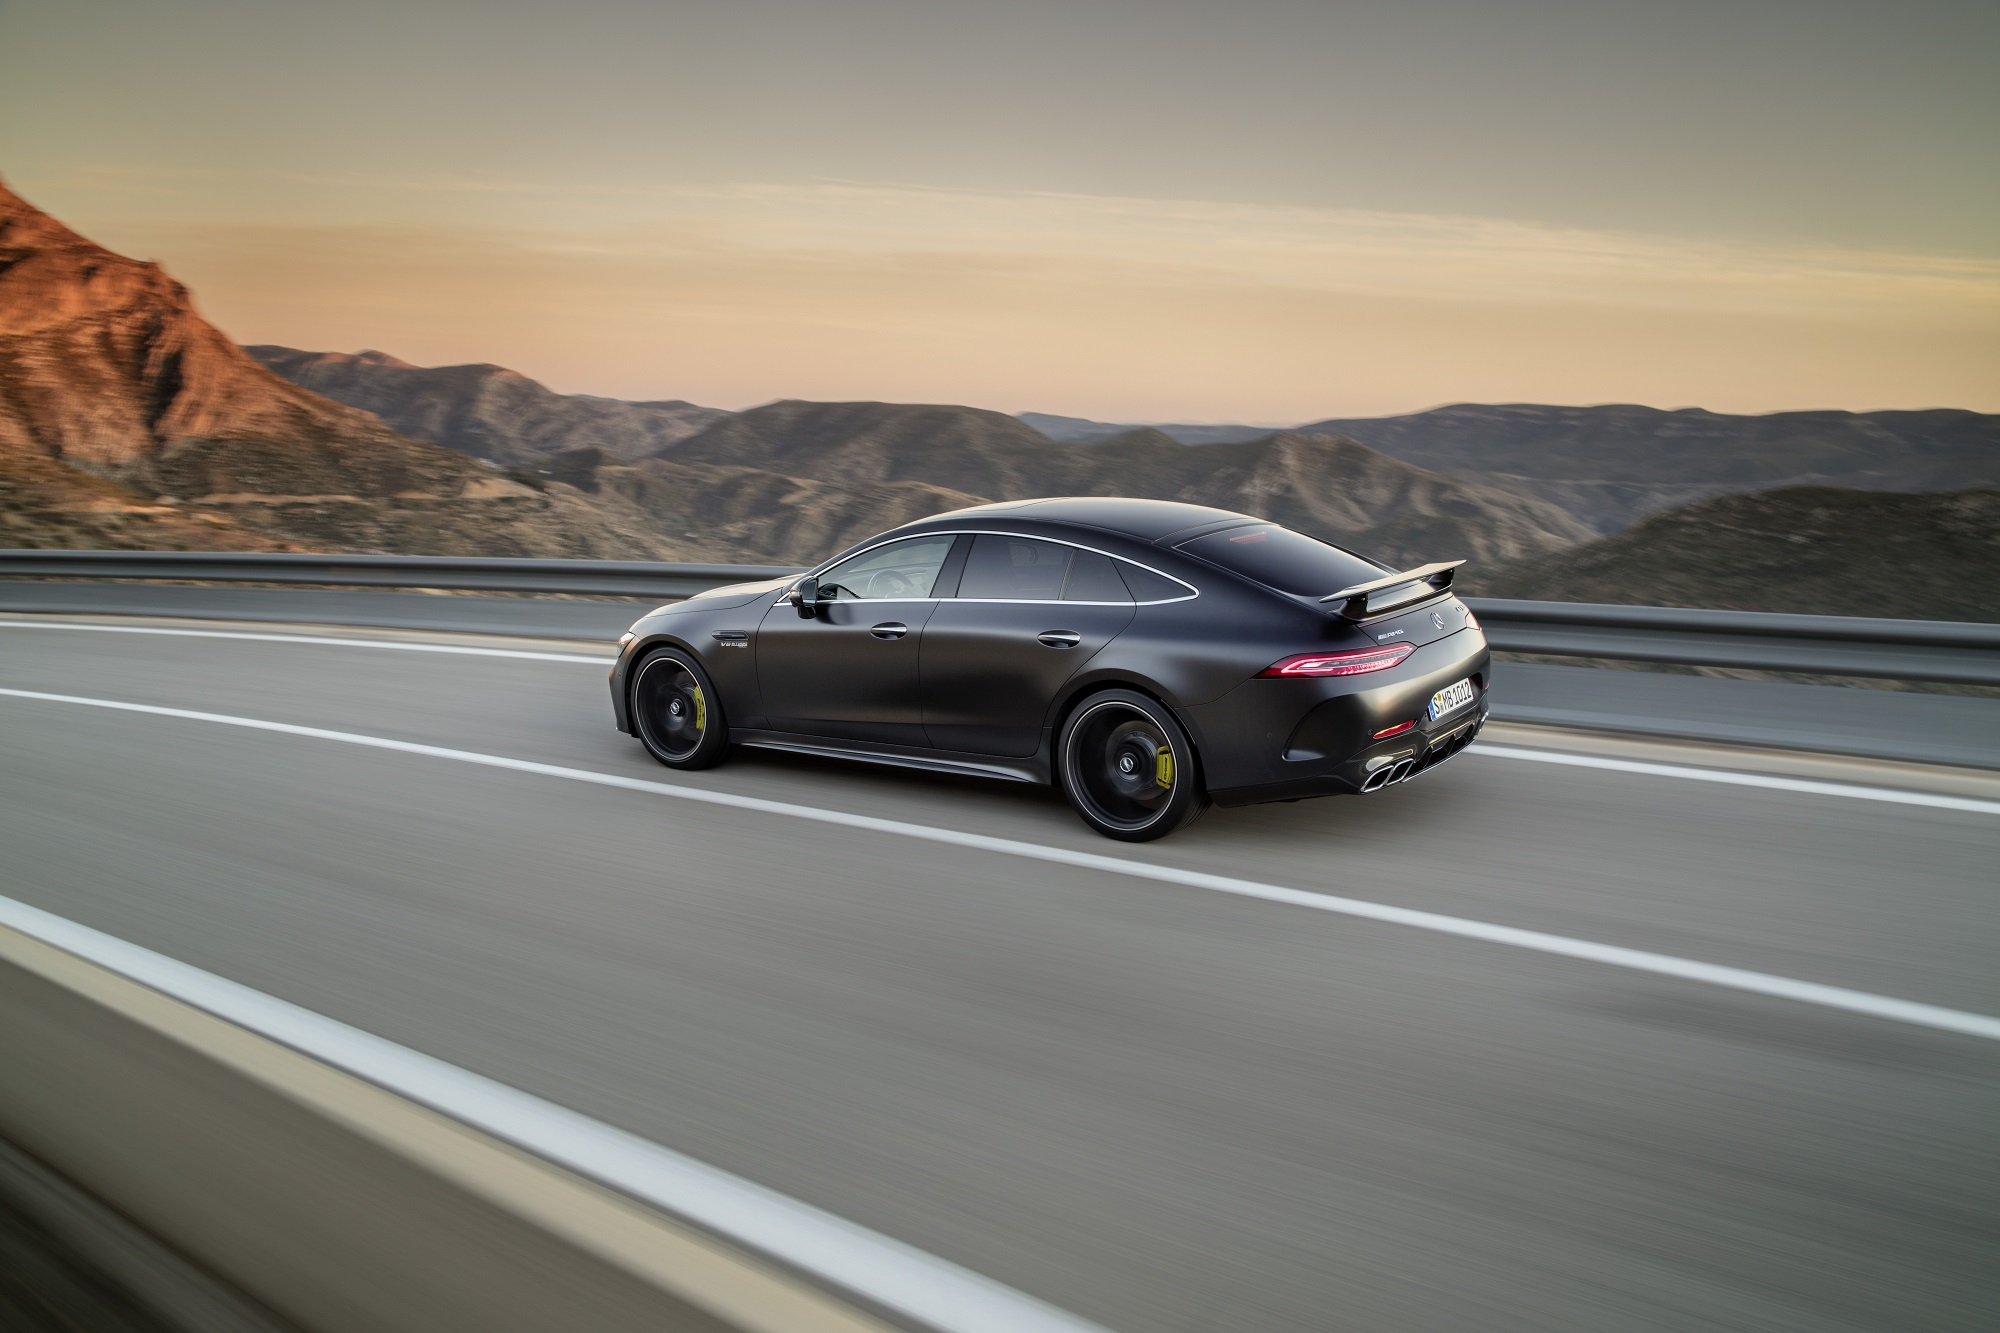 Mercedes-AMG GT 63 S 4MATIC+ 4-Türer Coupé - MBWorld